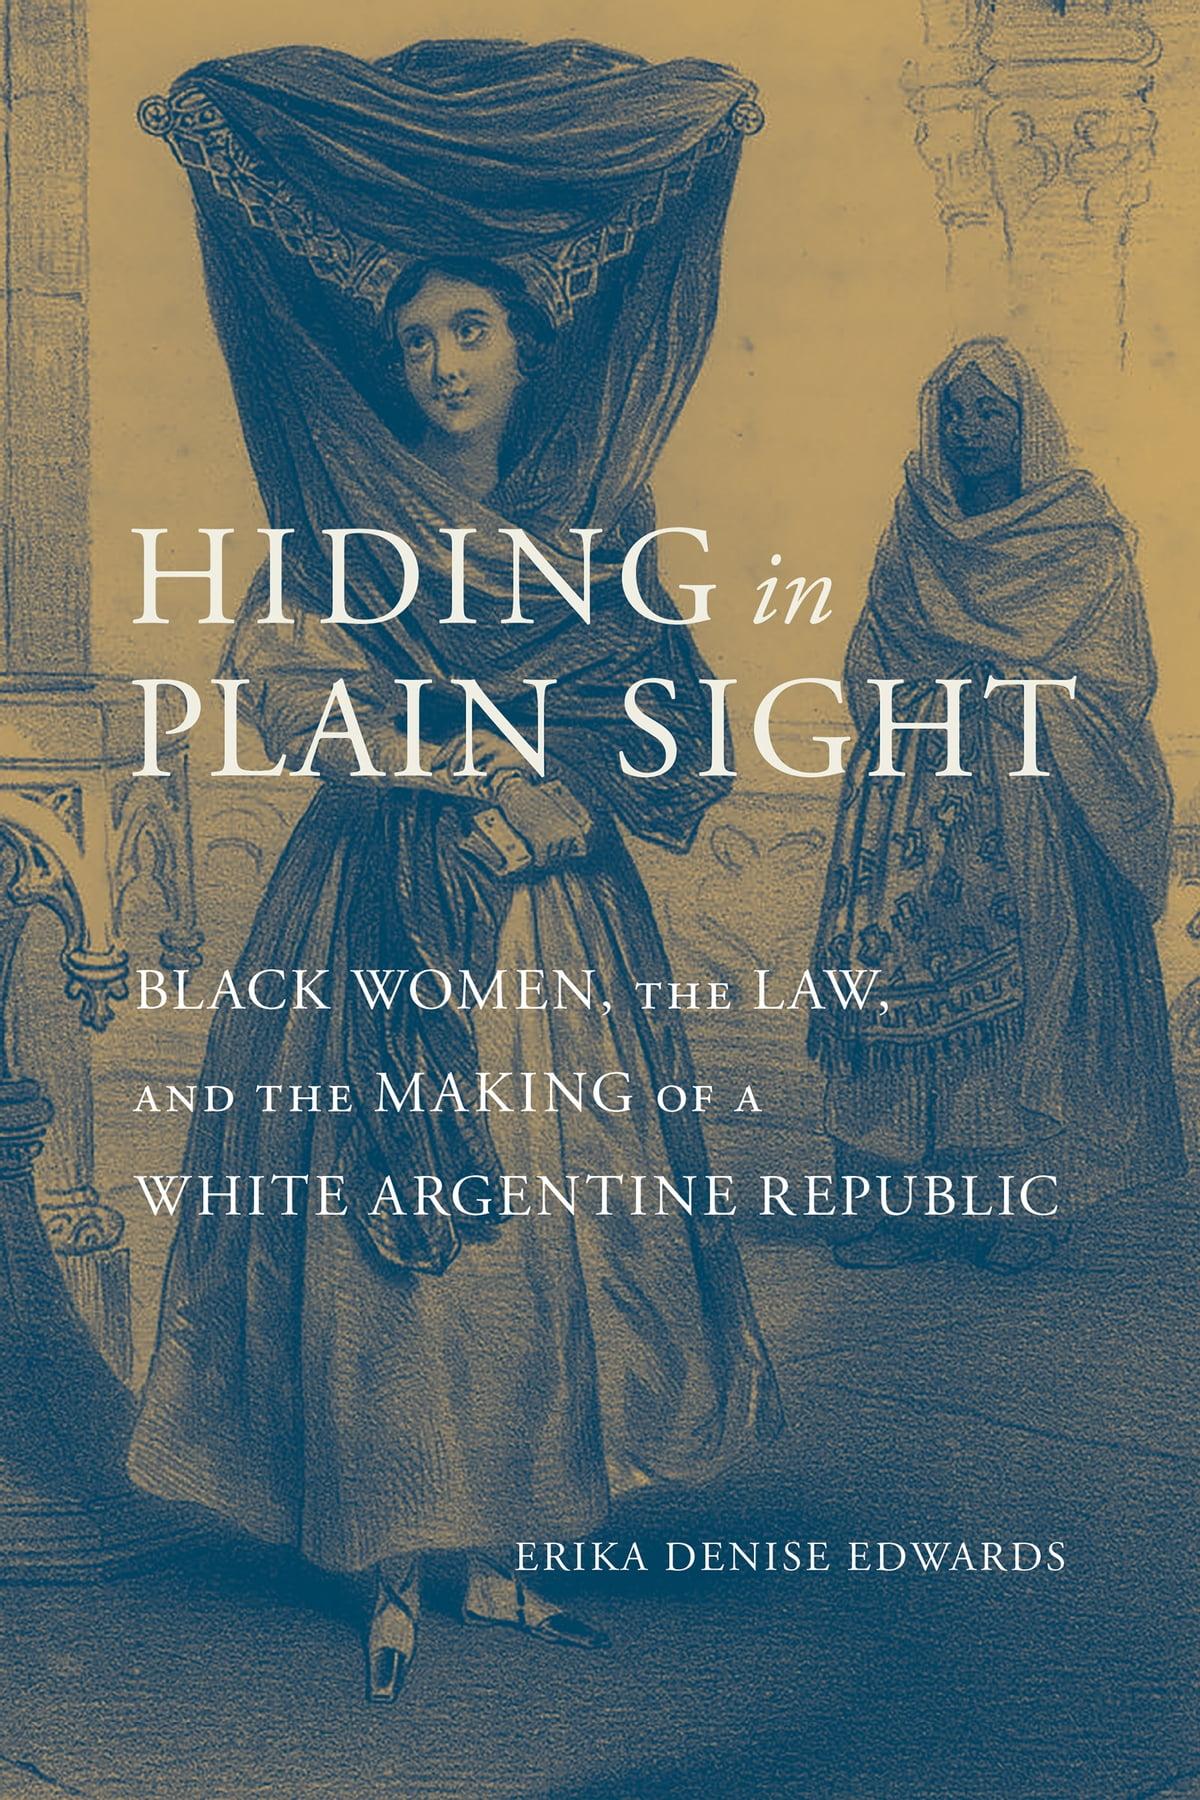 Hiding in Plain Sight eBook by Erika Denise Edwards - 9780817392659 | Rakuten Kobo